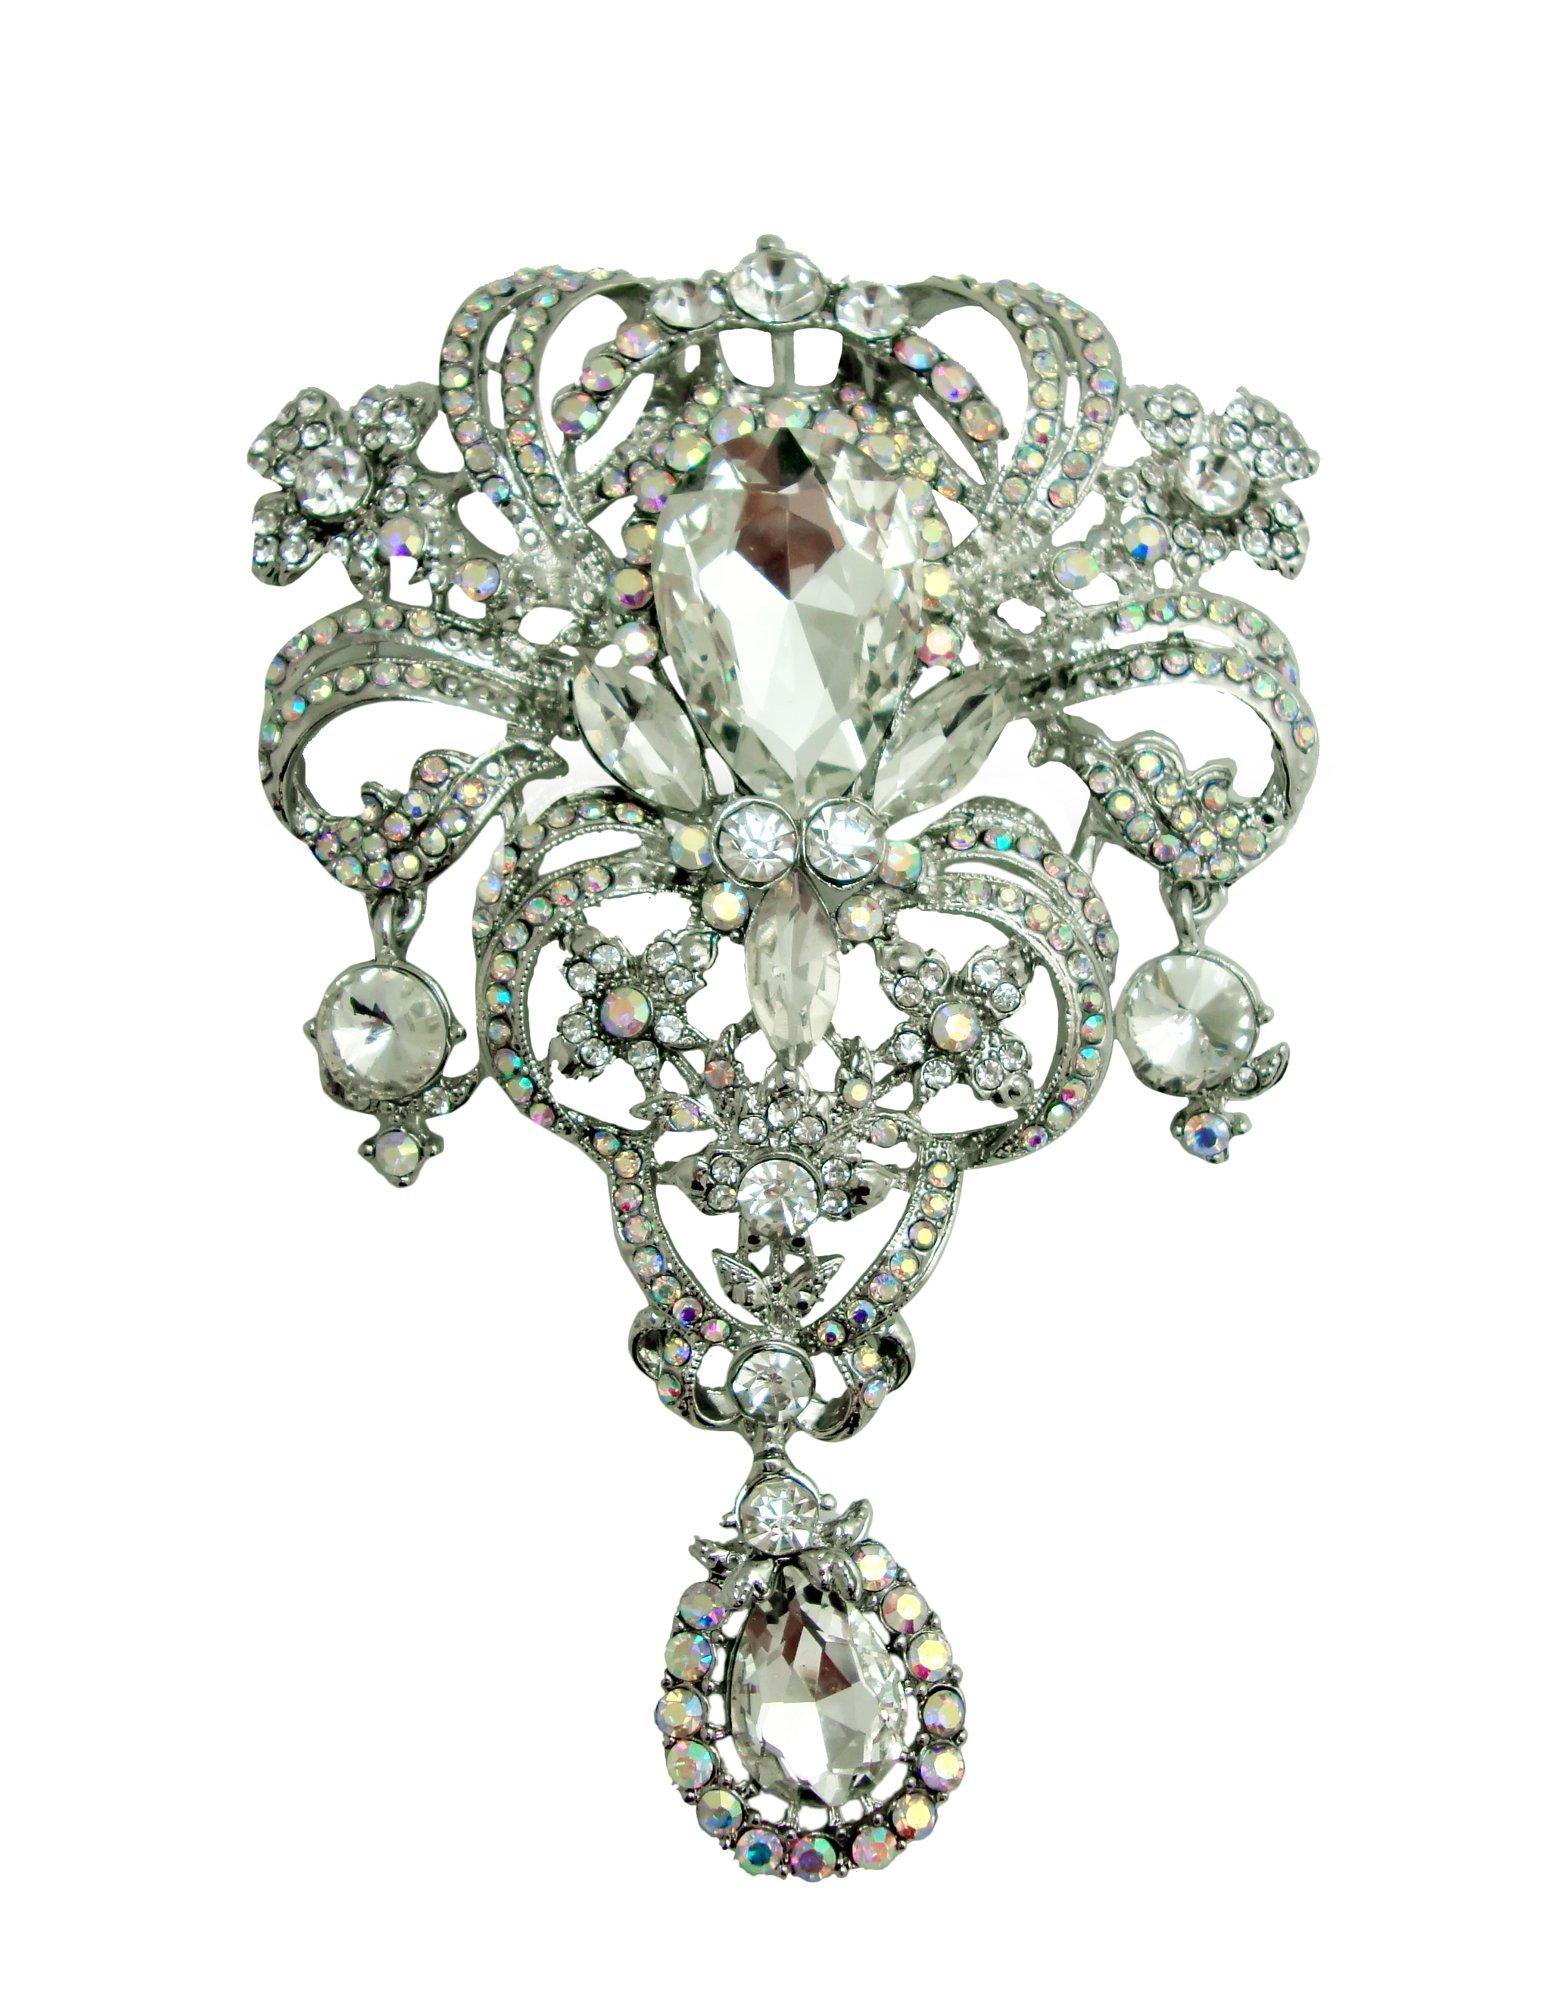 TTjewelry Classic Style Flower Drop Brooch Pin Rhinestone Crystal Pendant (White AB Silver-tone)